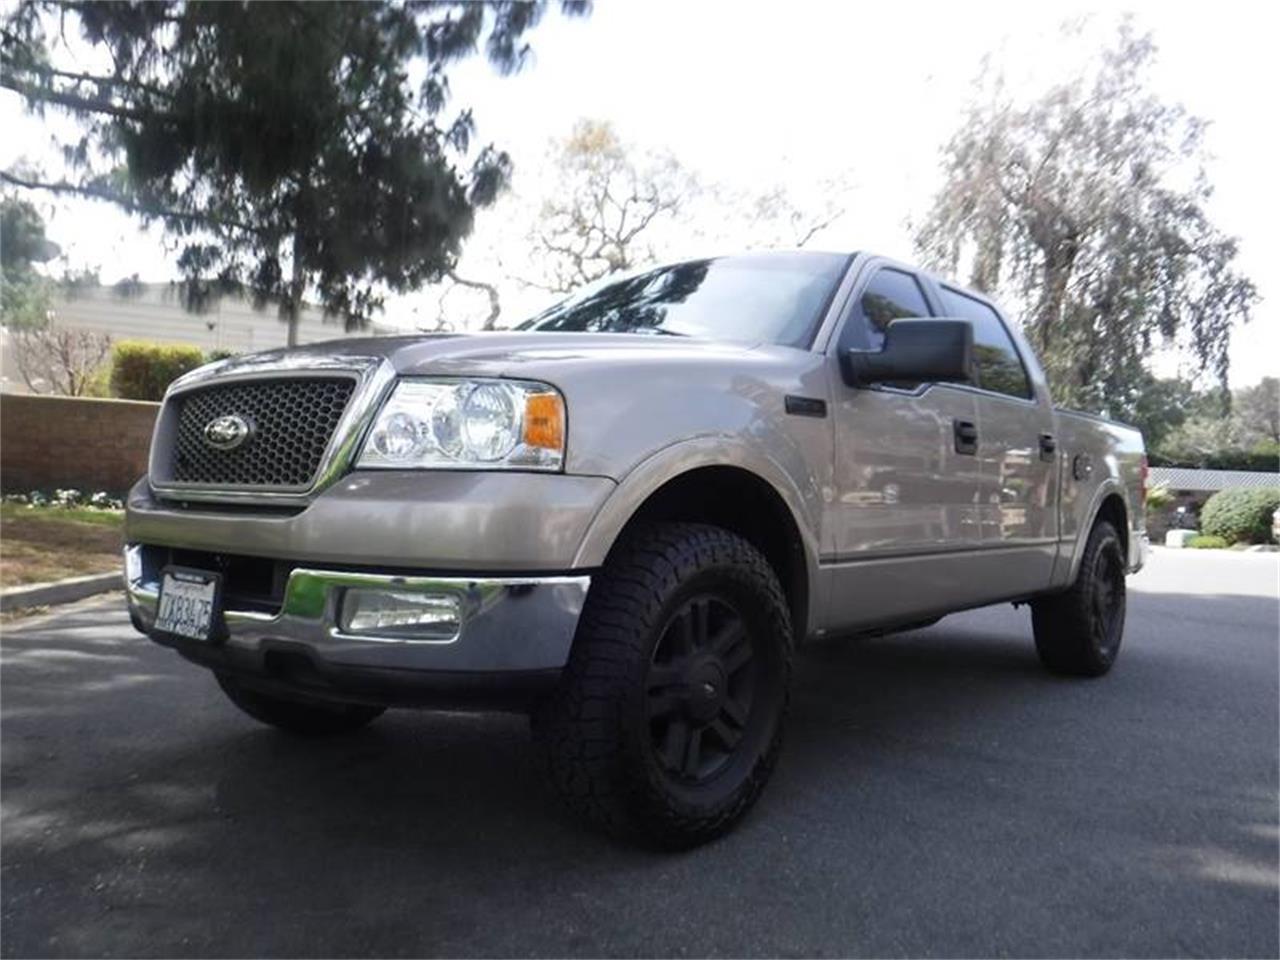 05 F150 Bumper >> For Sale 2005 Ford F150 In Thousand Oaks California